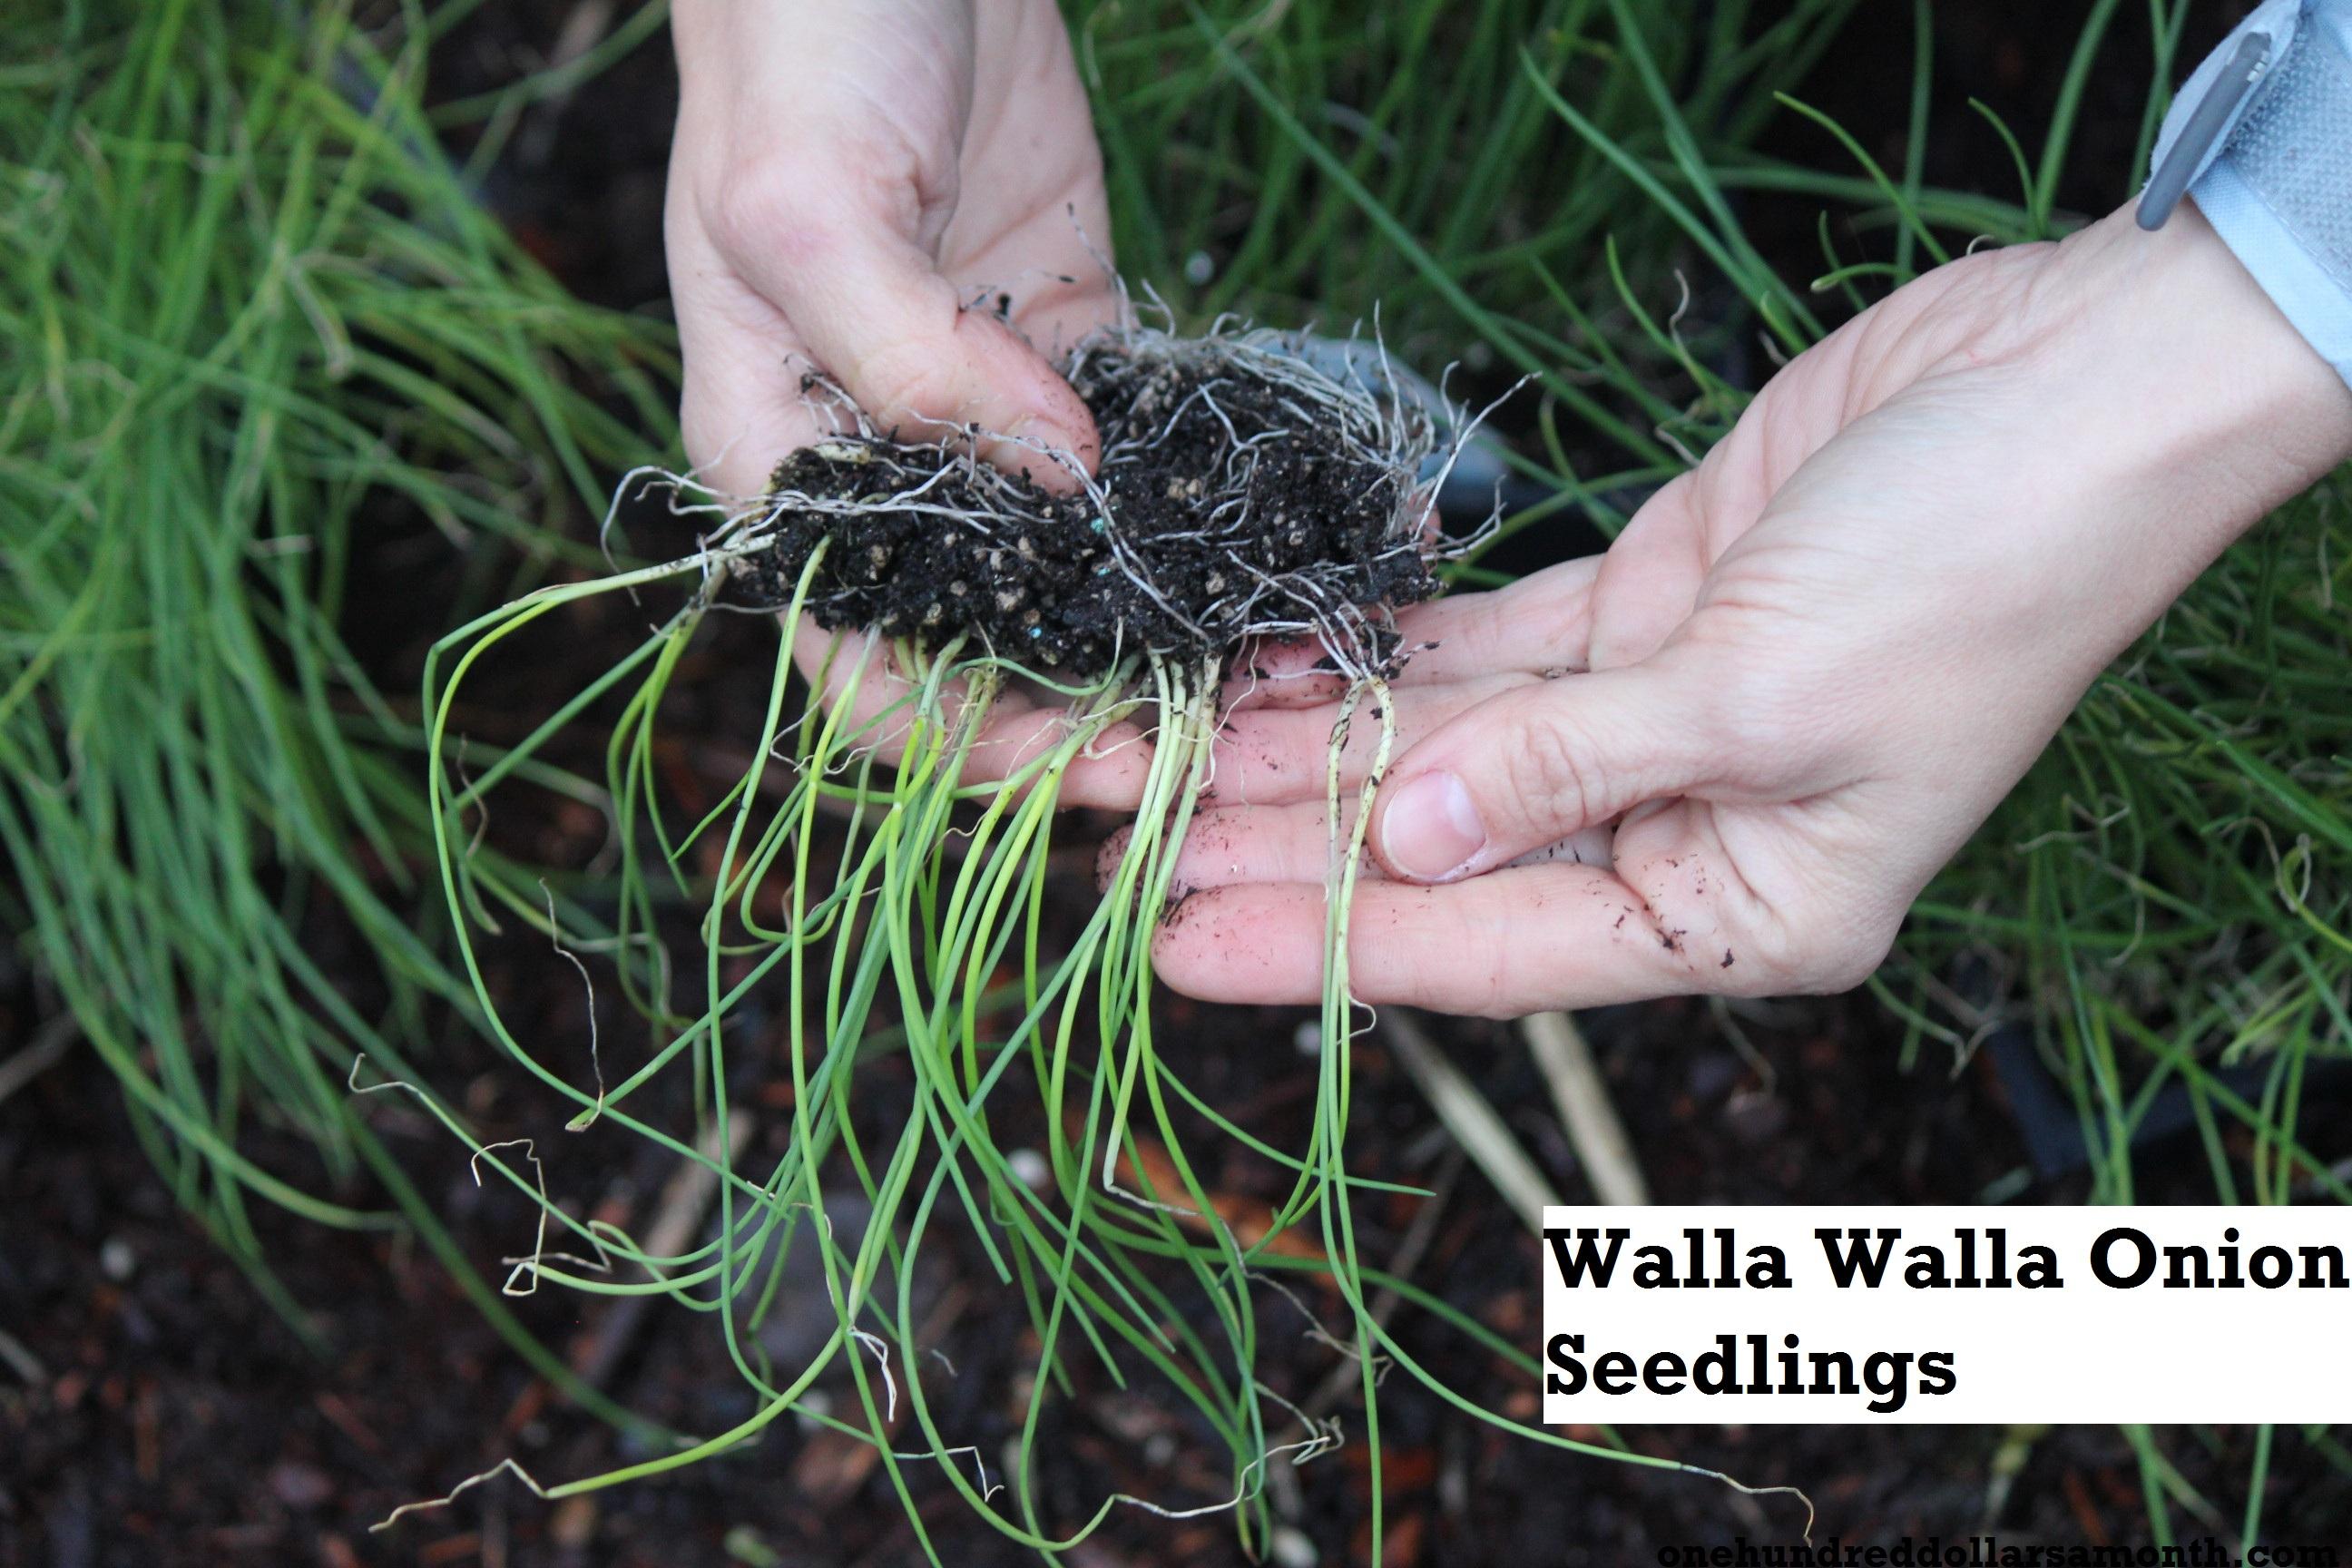 How to Grow Your Own Food: Mavis Plants Onions In The Garden, Again